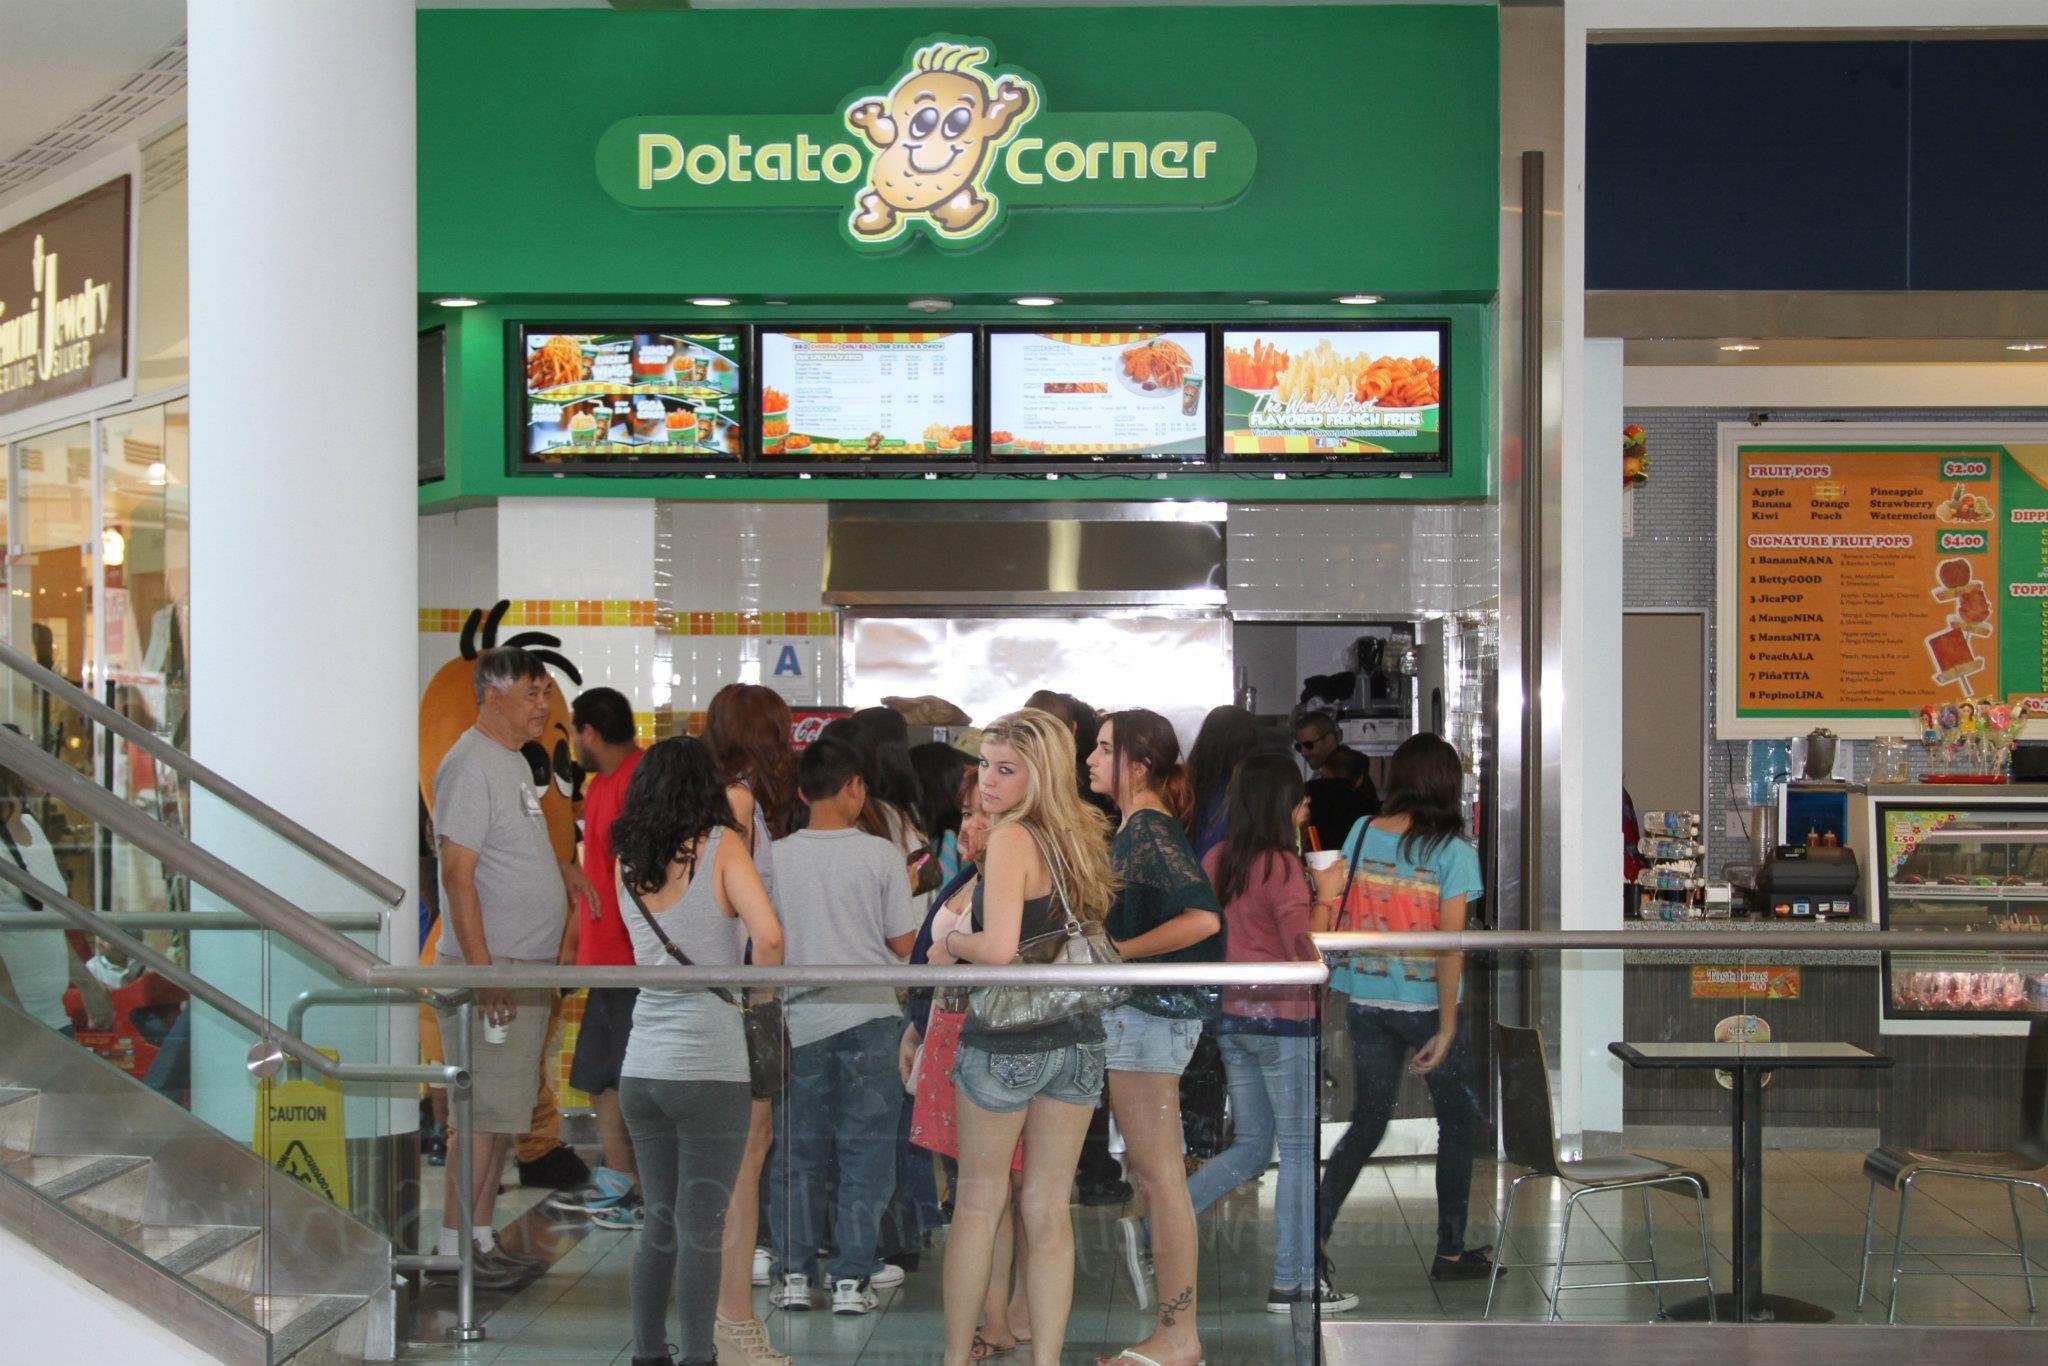 The Grand Opening For Potato Corner At The Plaza Bonita Mall